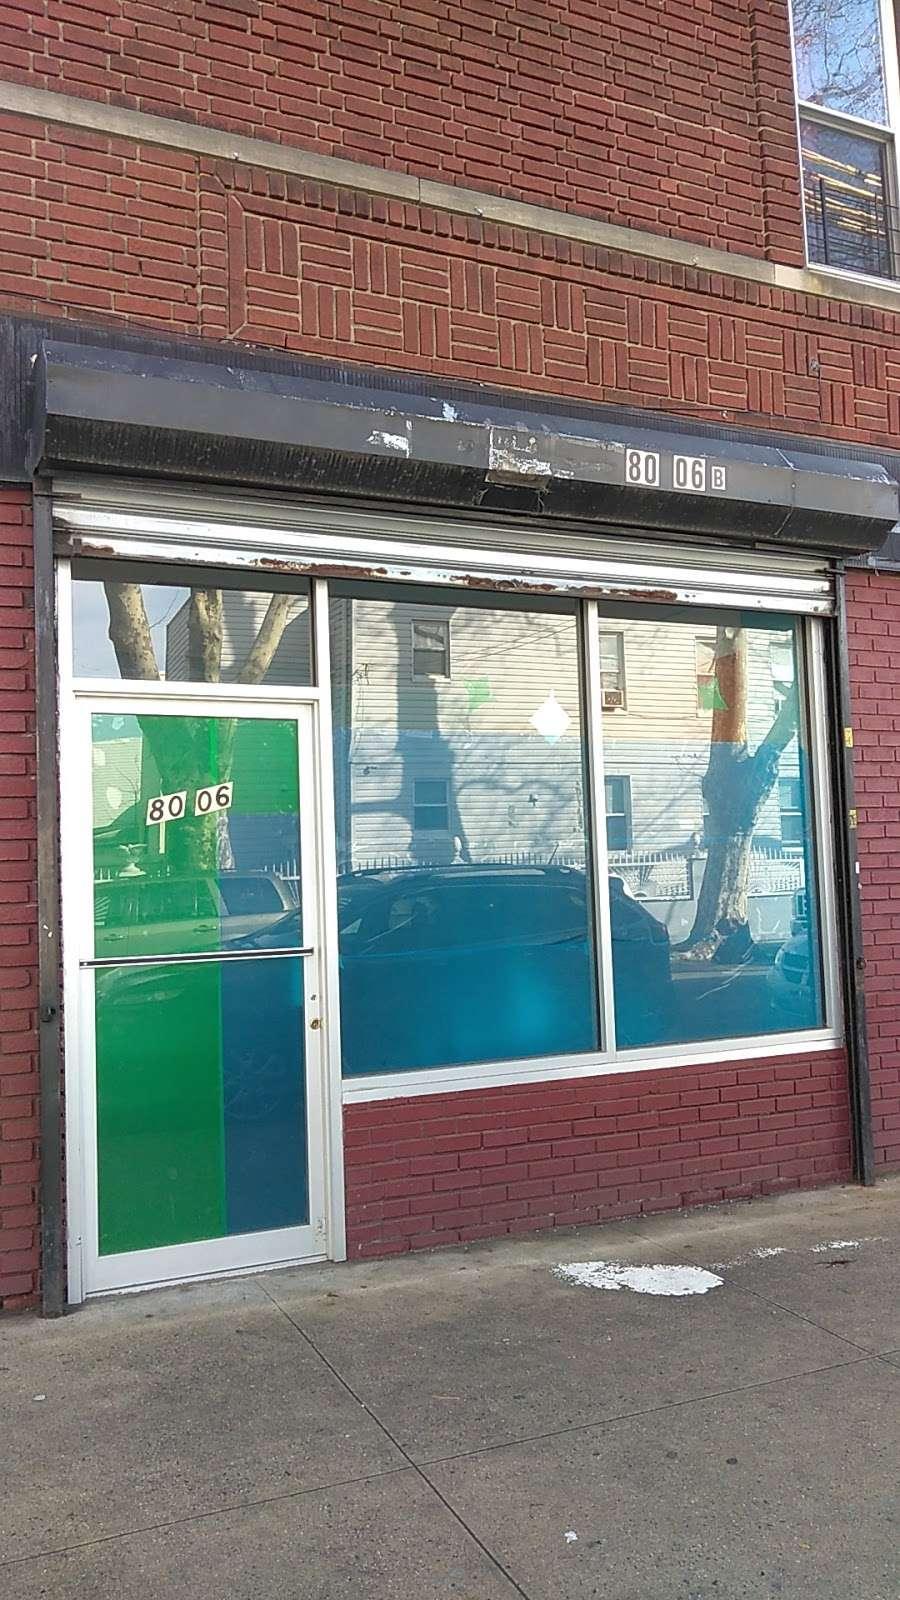 L Happy Boys24 - store  | Photo 3 of 3 | Address: 80-99-80, 1, 91st Ave, Woodhaven, NY 11421, USA | Phone: (646) 400-7803